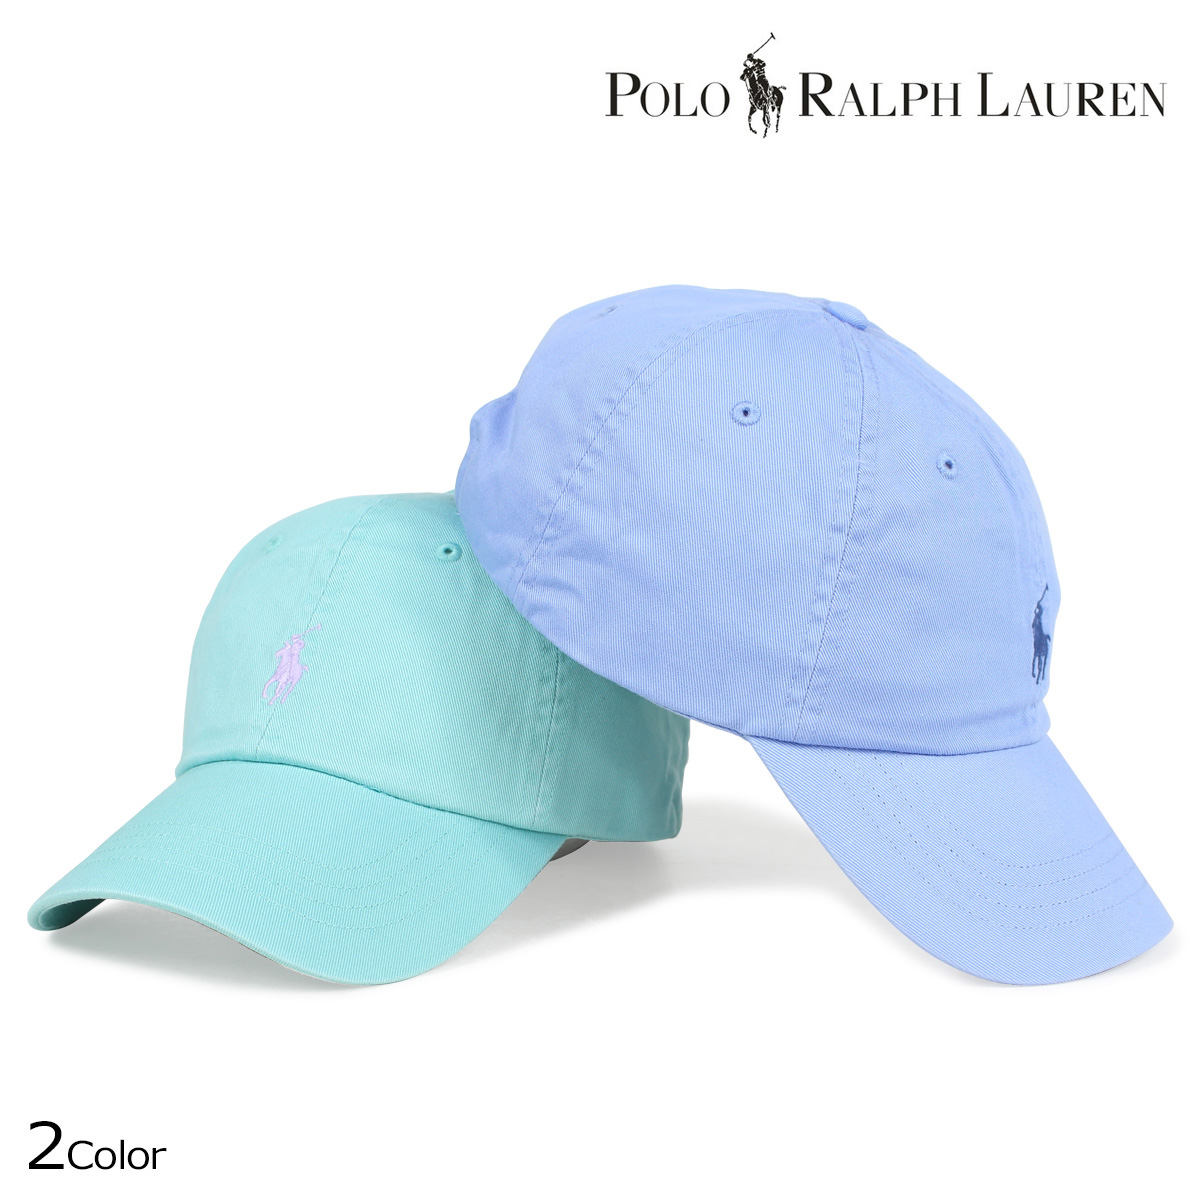 f2e42cef1 SneaK Online Shop: Polo Ralph Lauren POLO RALPH LAUREN hat men gap ...